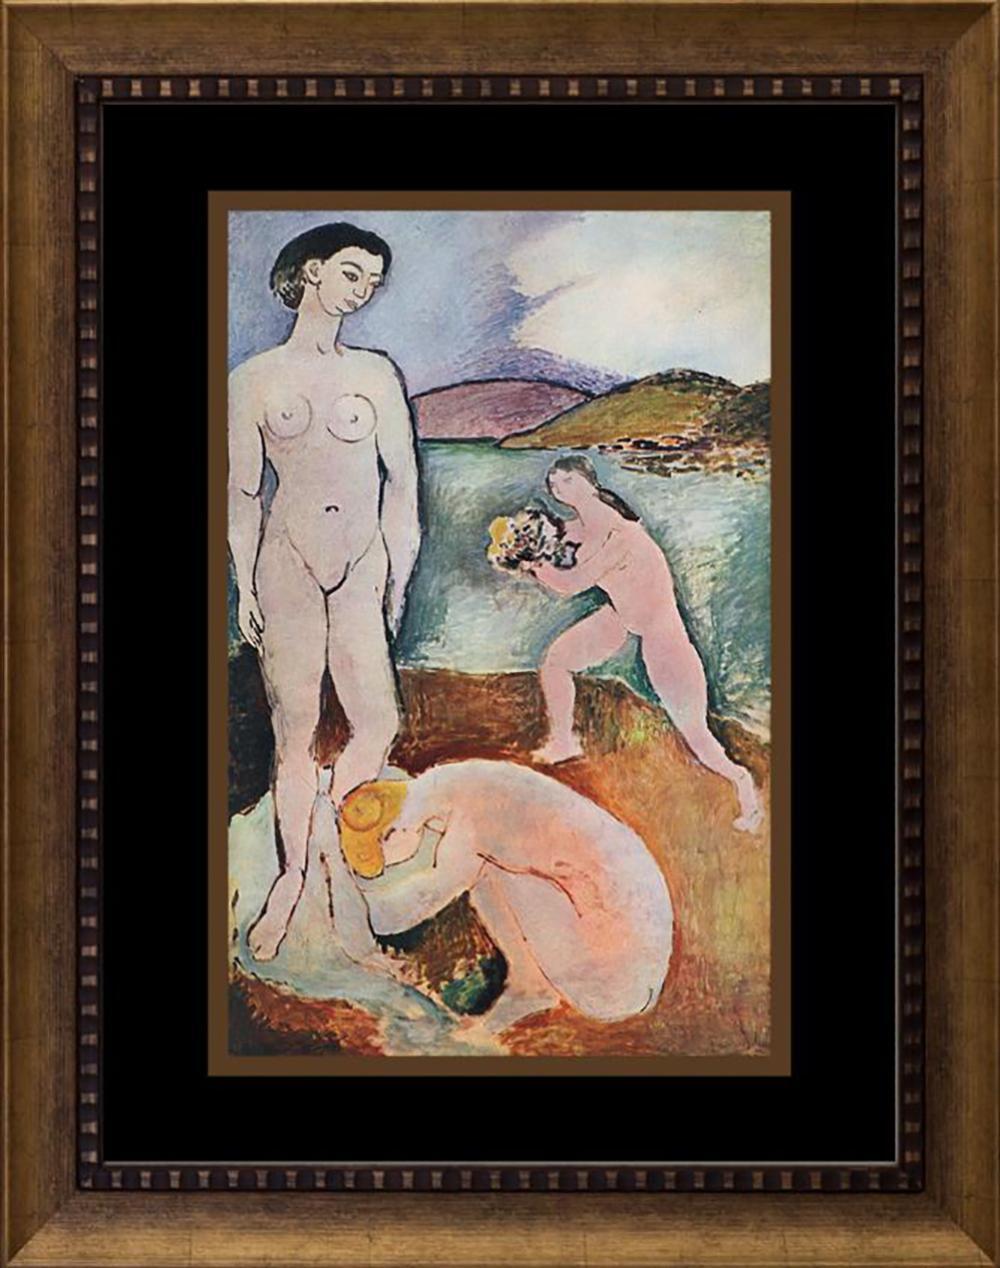 Lot 7184: Henri Matisse 1948 Lithograph